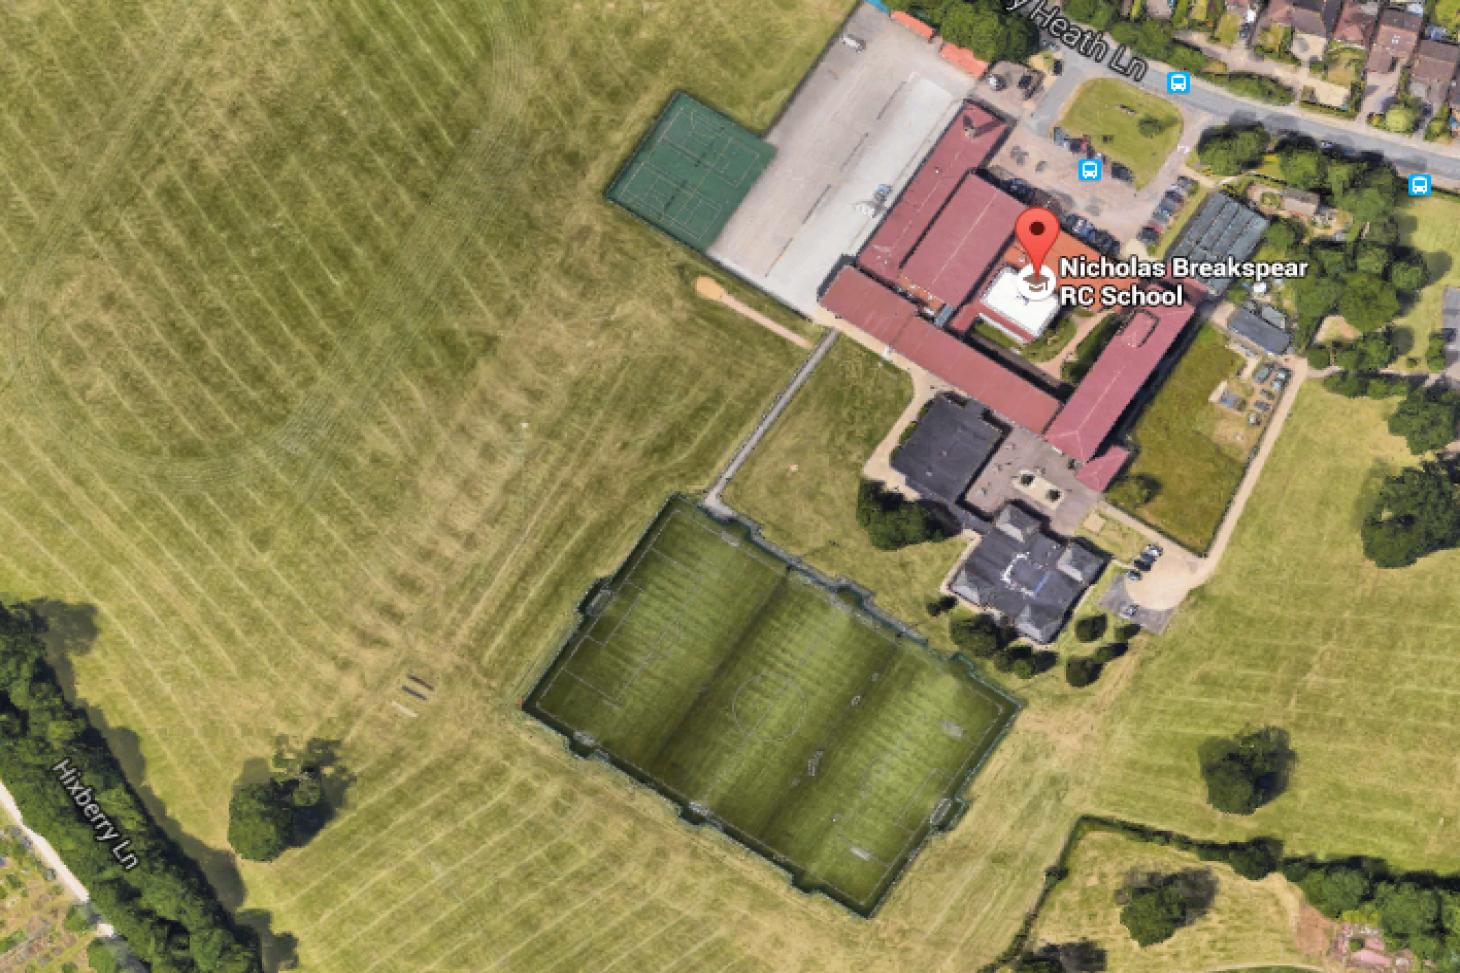 Nicholas Breakspear RC School Outdoor   Hard (macadam) tennis court